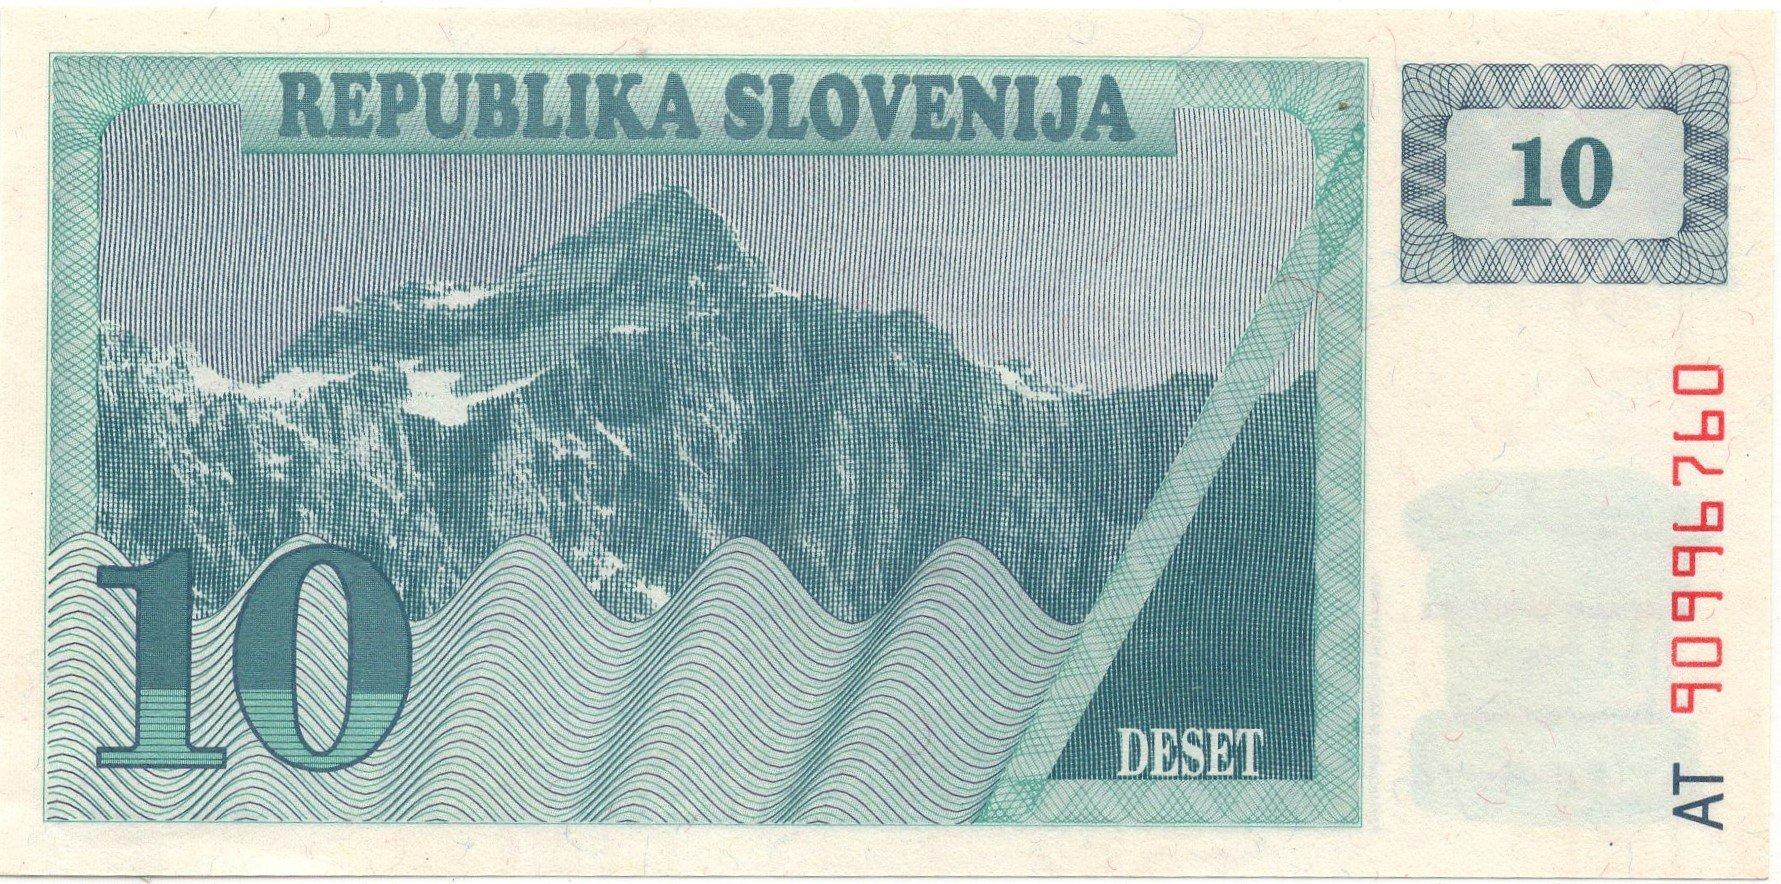 slovenia 10 tolar banknote for sale